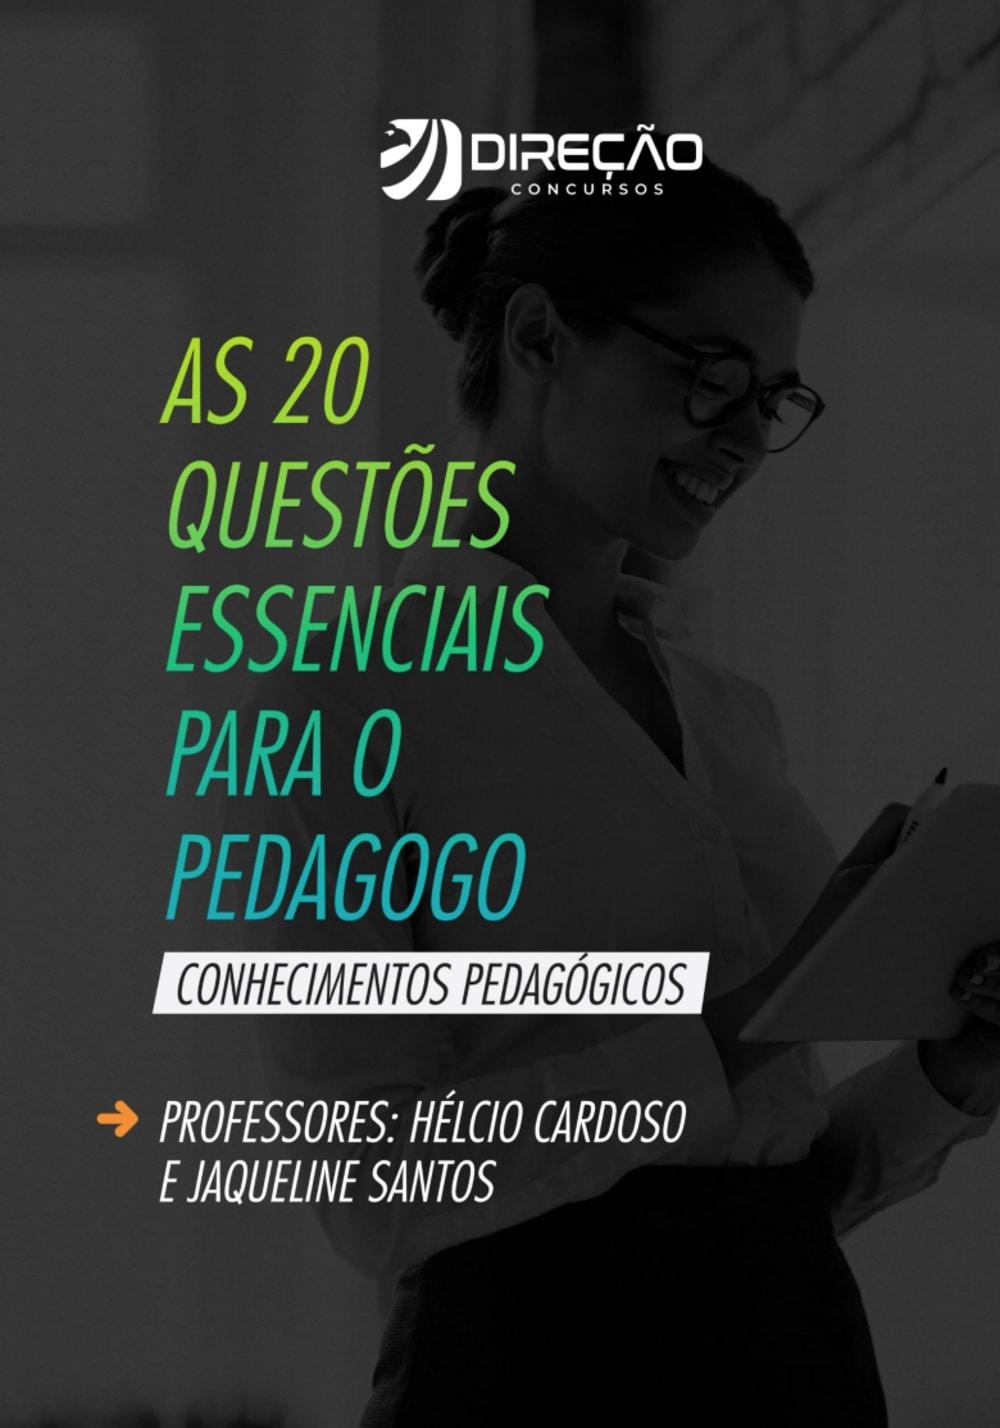 https://www.direcaoconcursos.com.br/gratuito/20-questoes-pedagogo